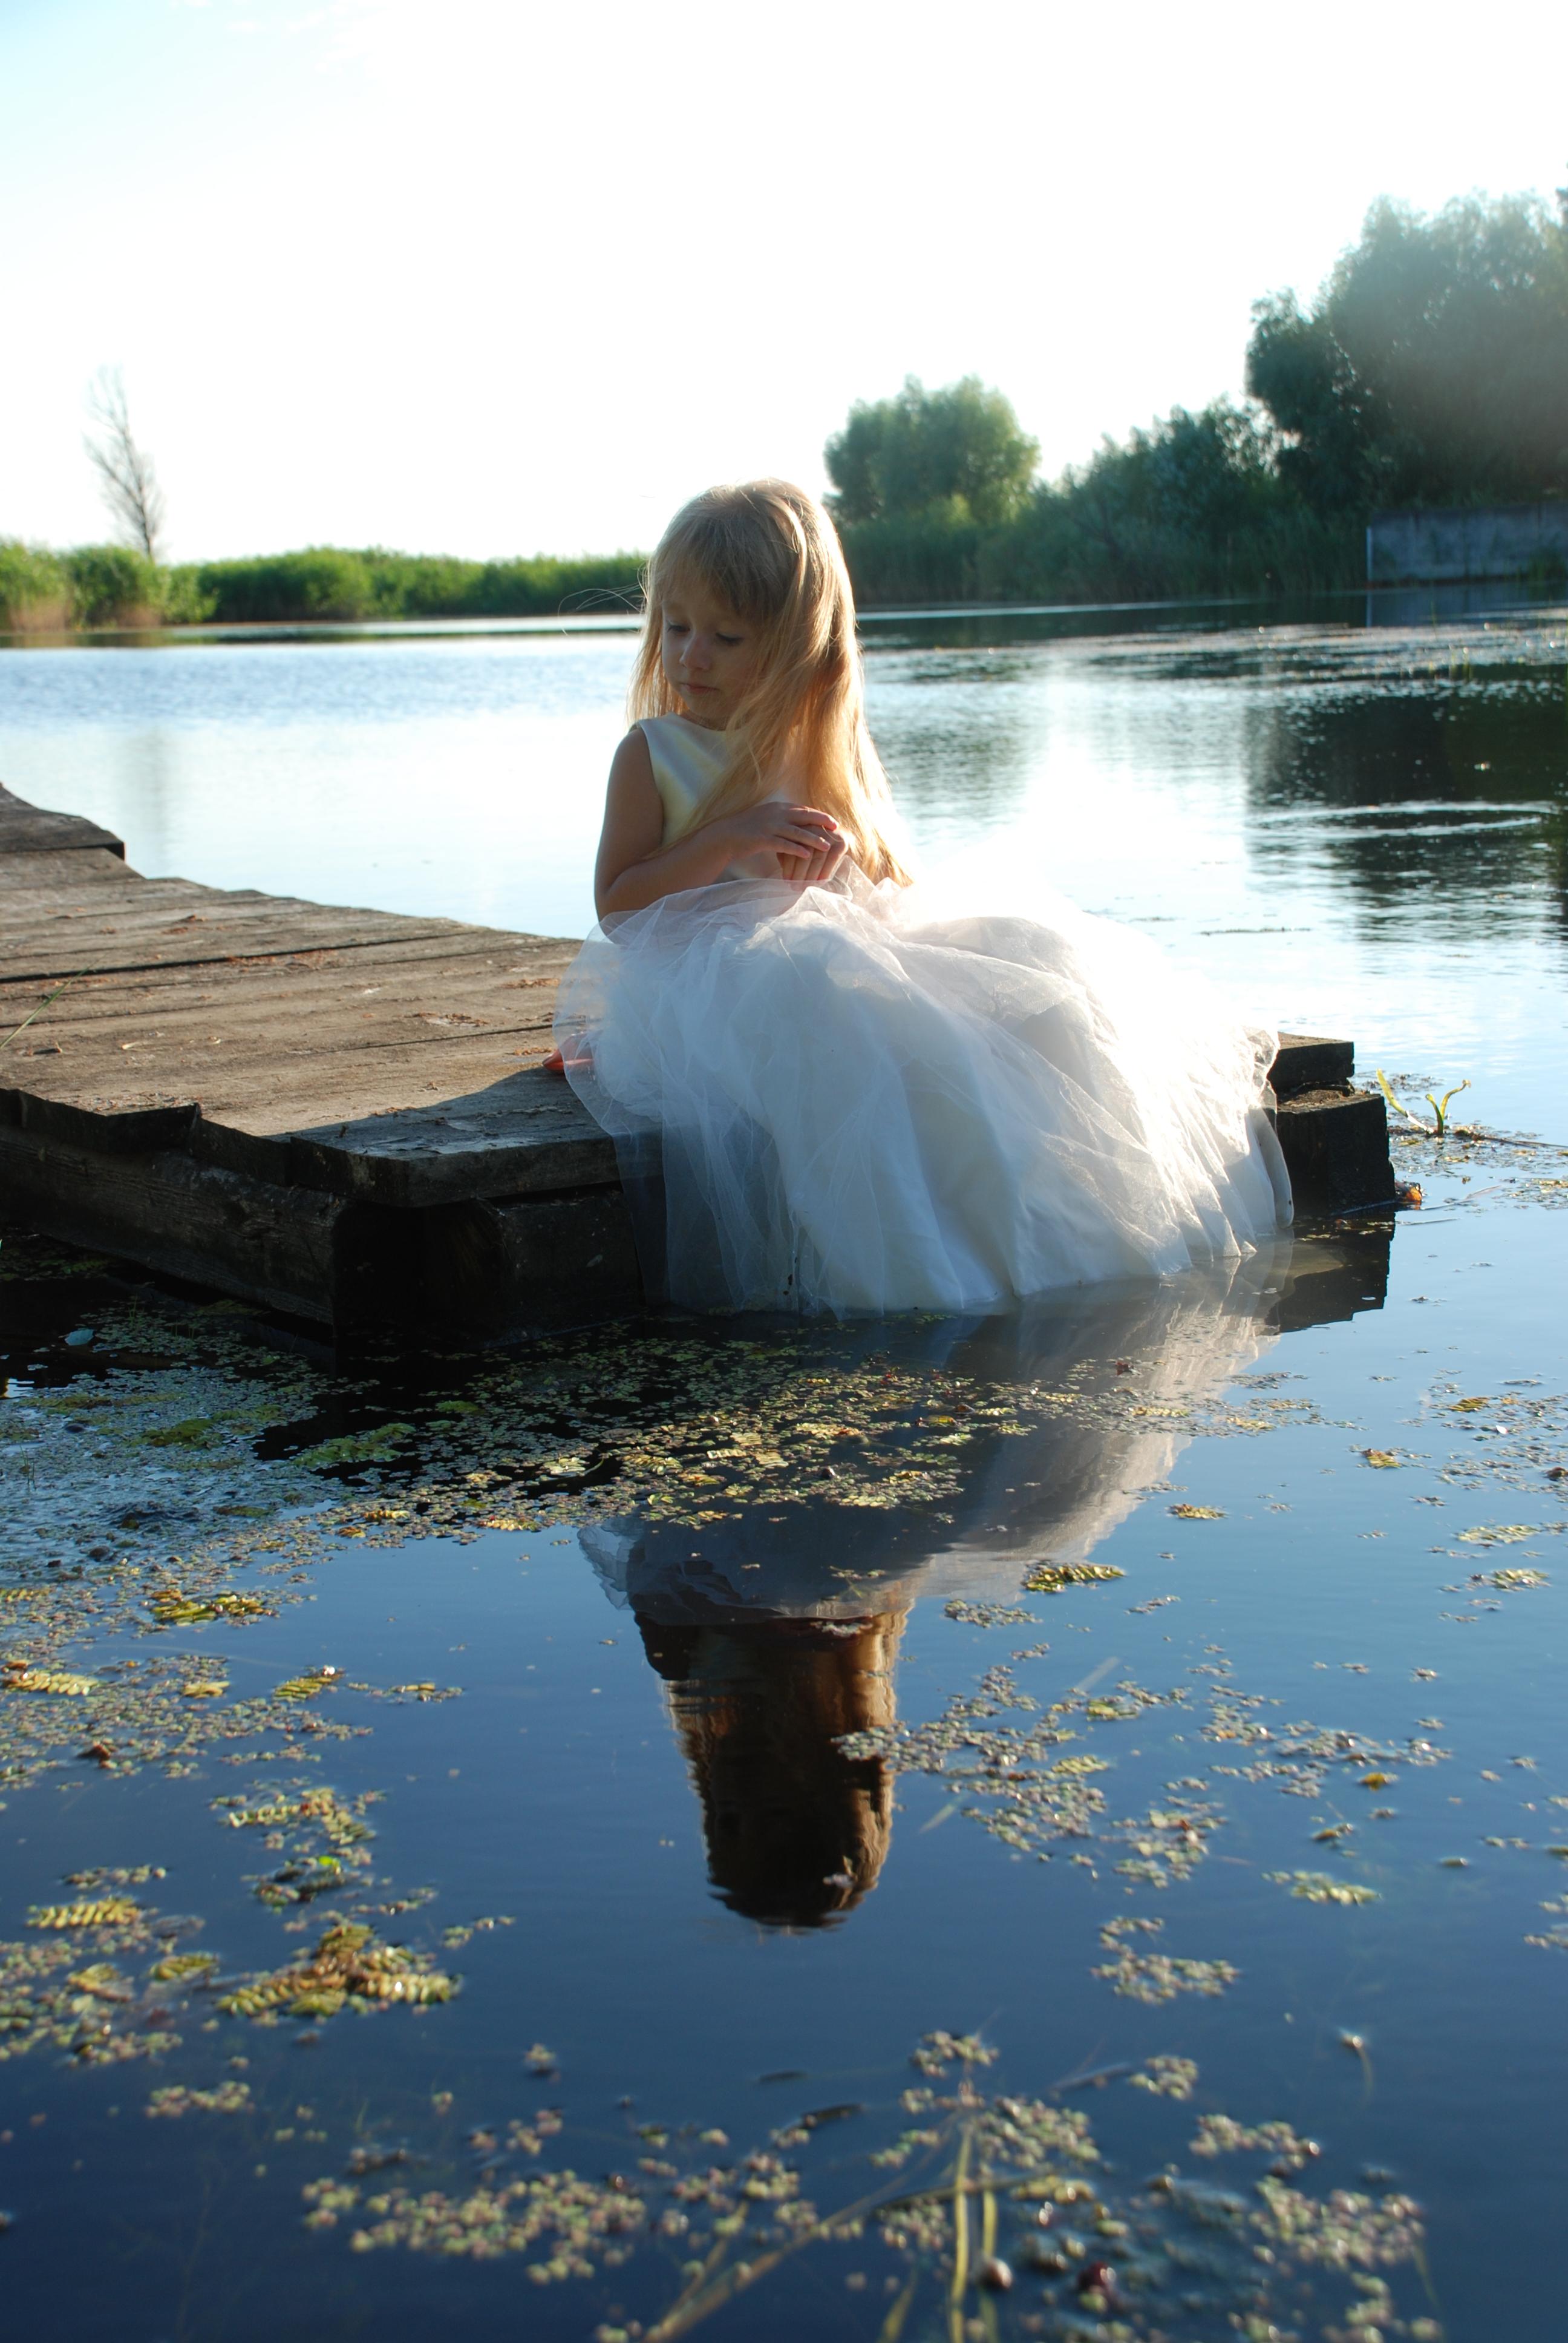 In the water_68 by anastasiya-landa